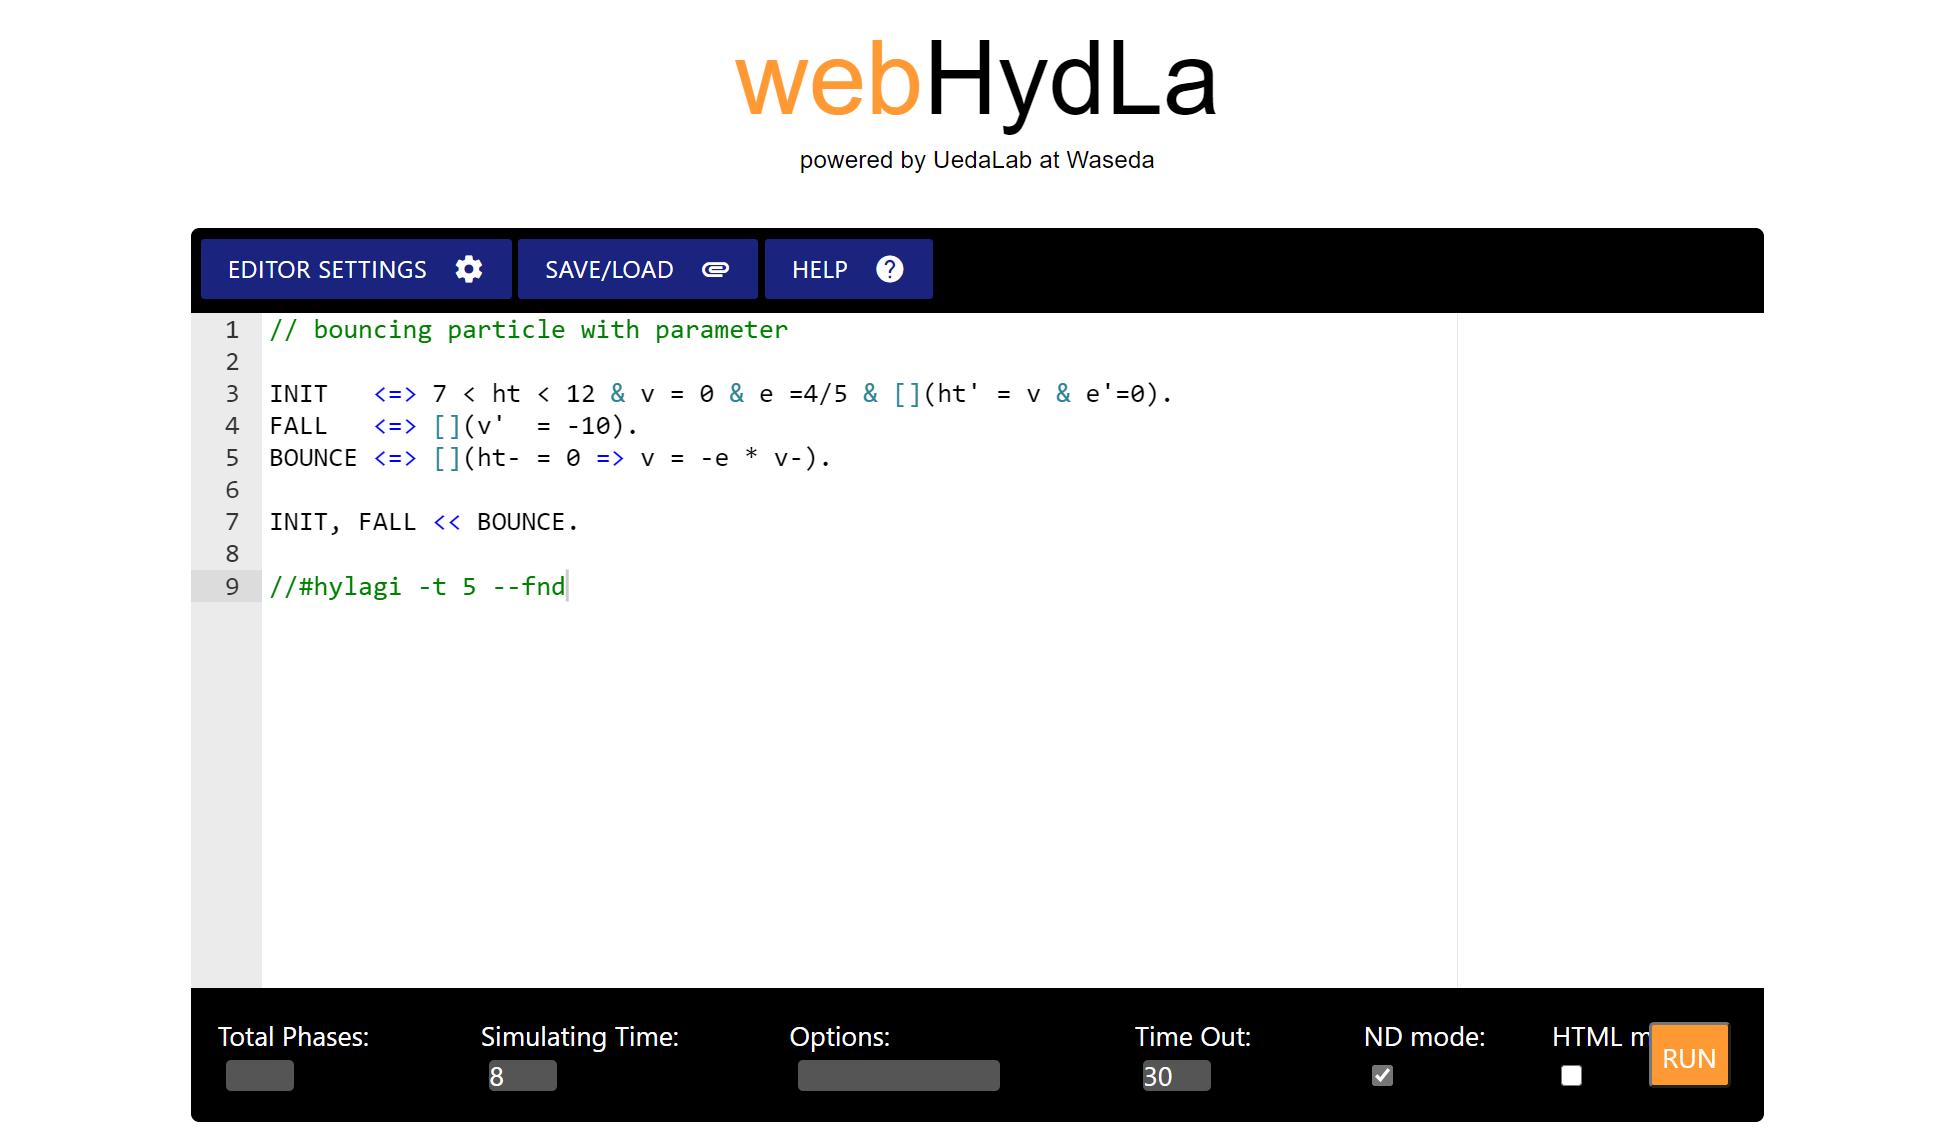 webHydLa-editor.png